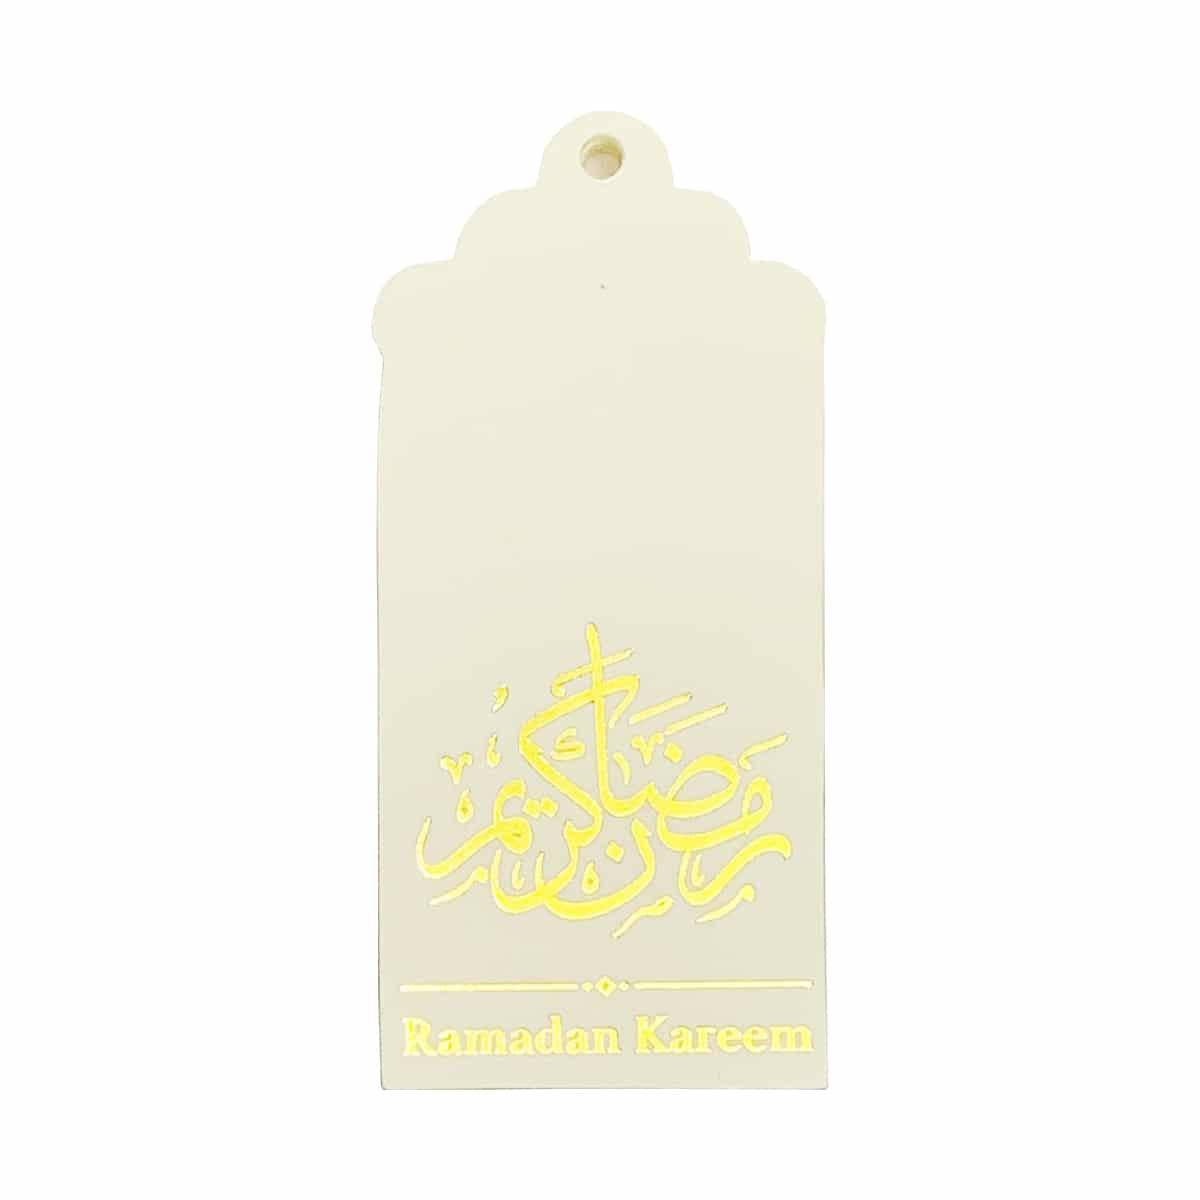 Ramadan Kareem Gift Tags